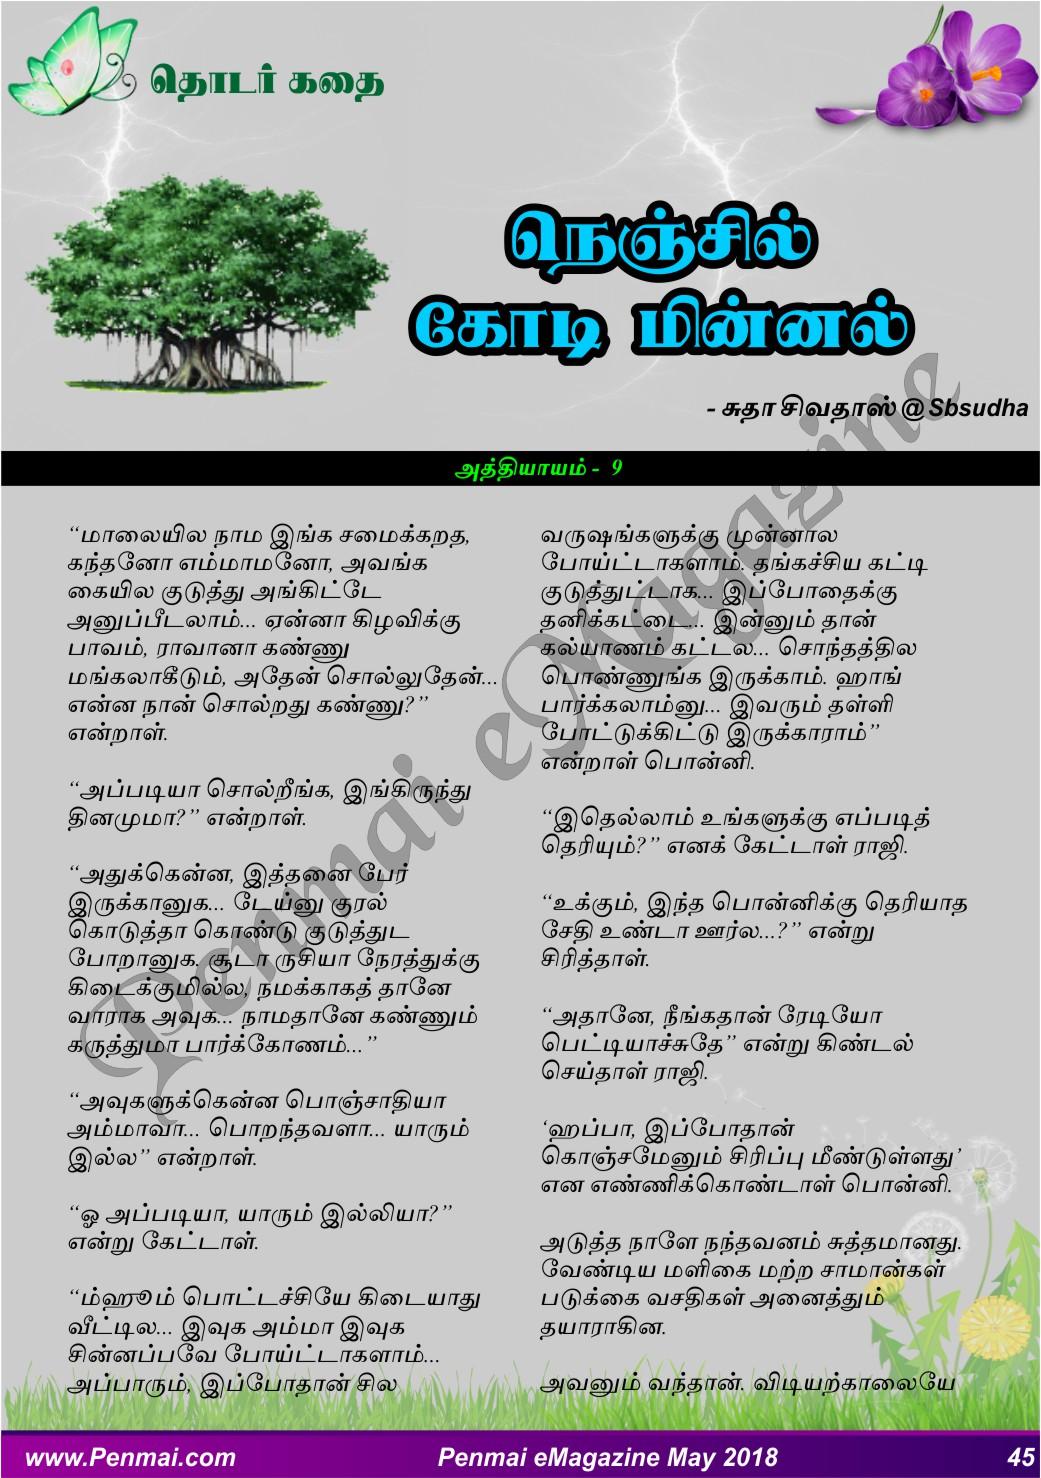 Penmai-eMagazine-May-2018-45.jpg